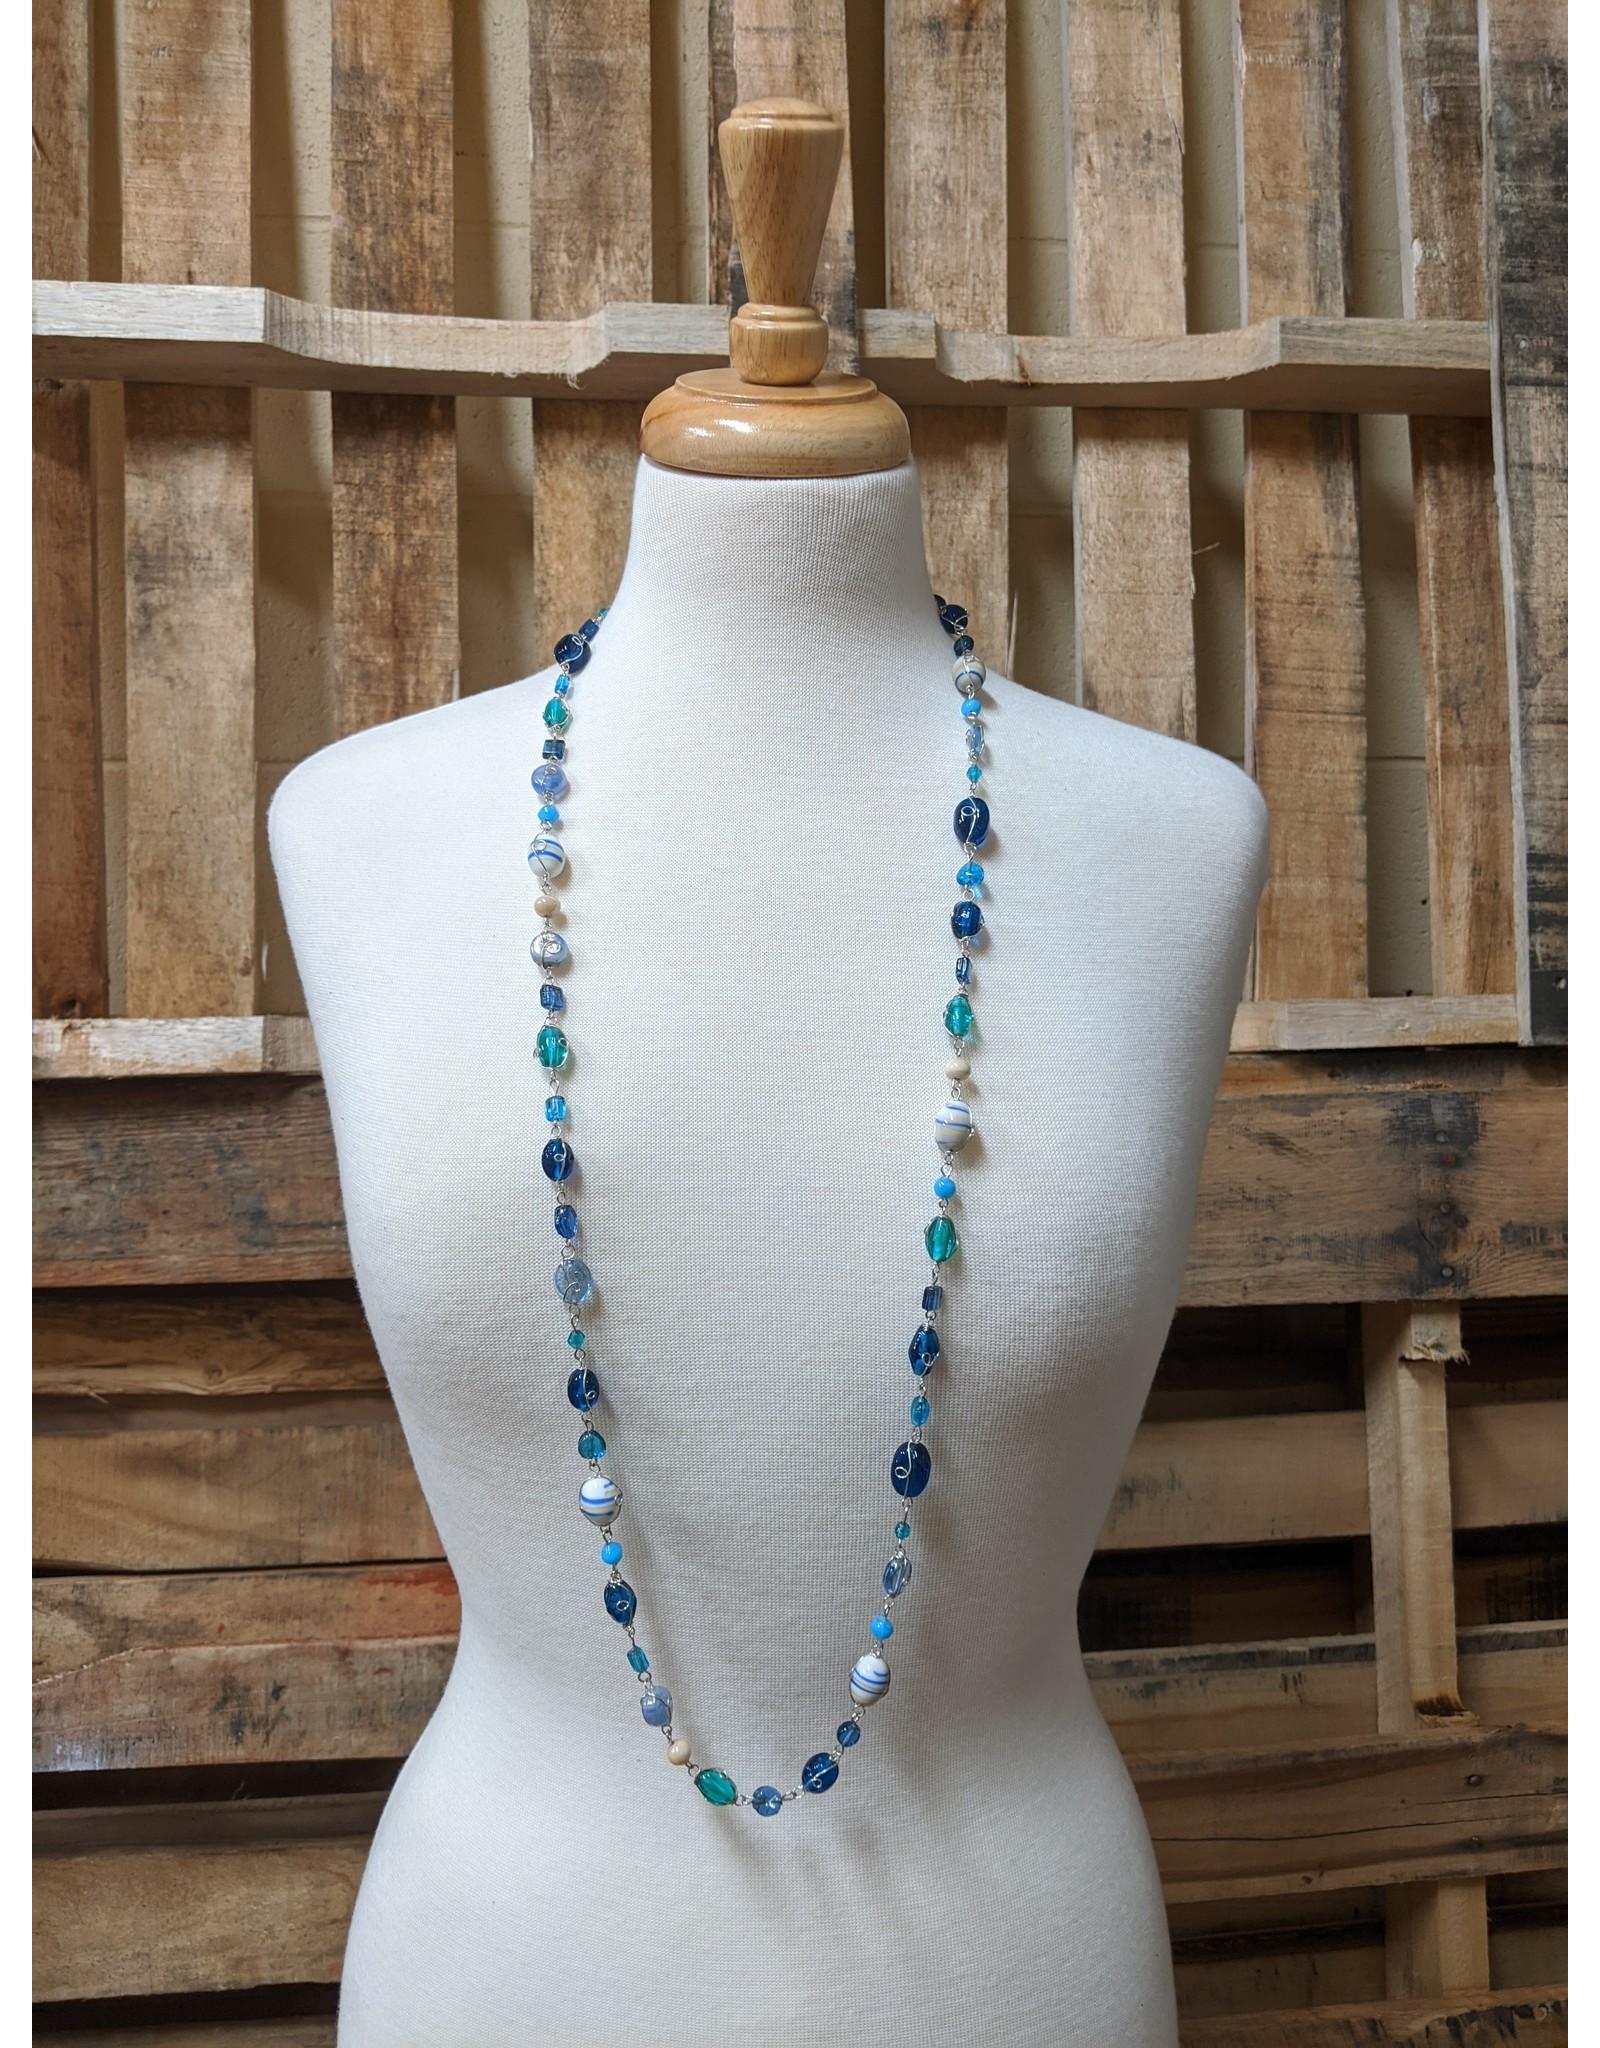 Ten Thousand Villages Ocean Blue Beaded Necklace